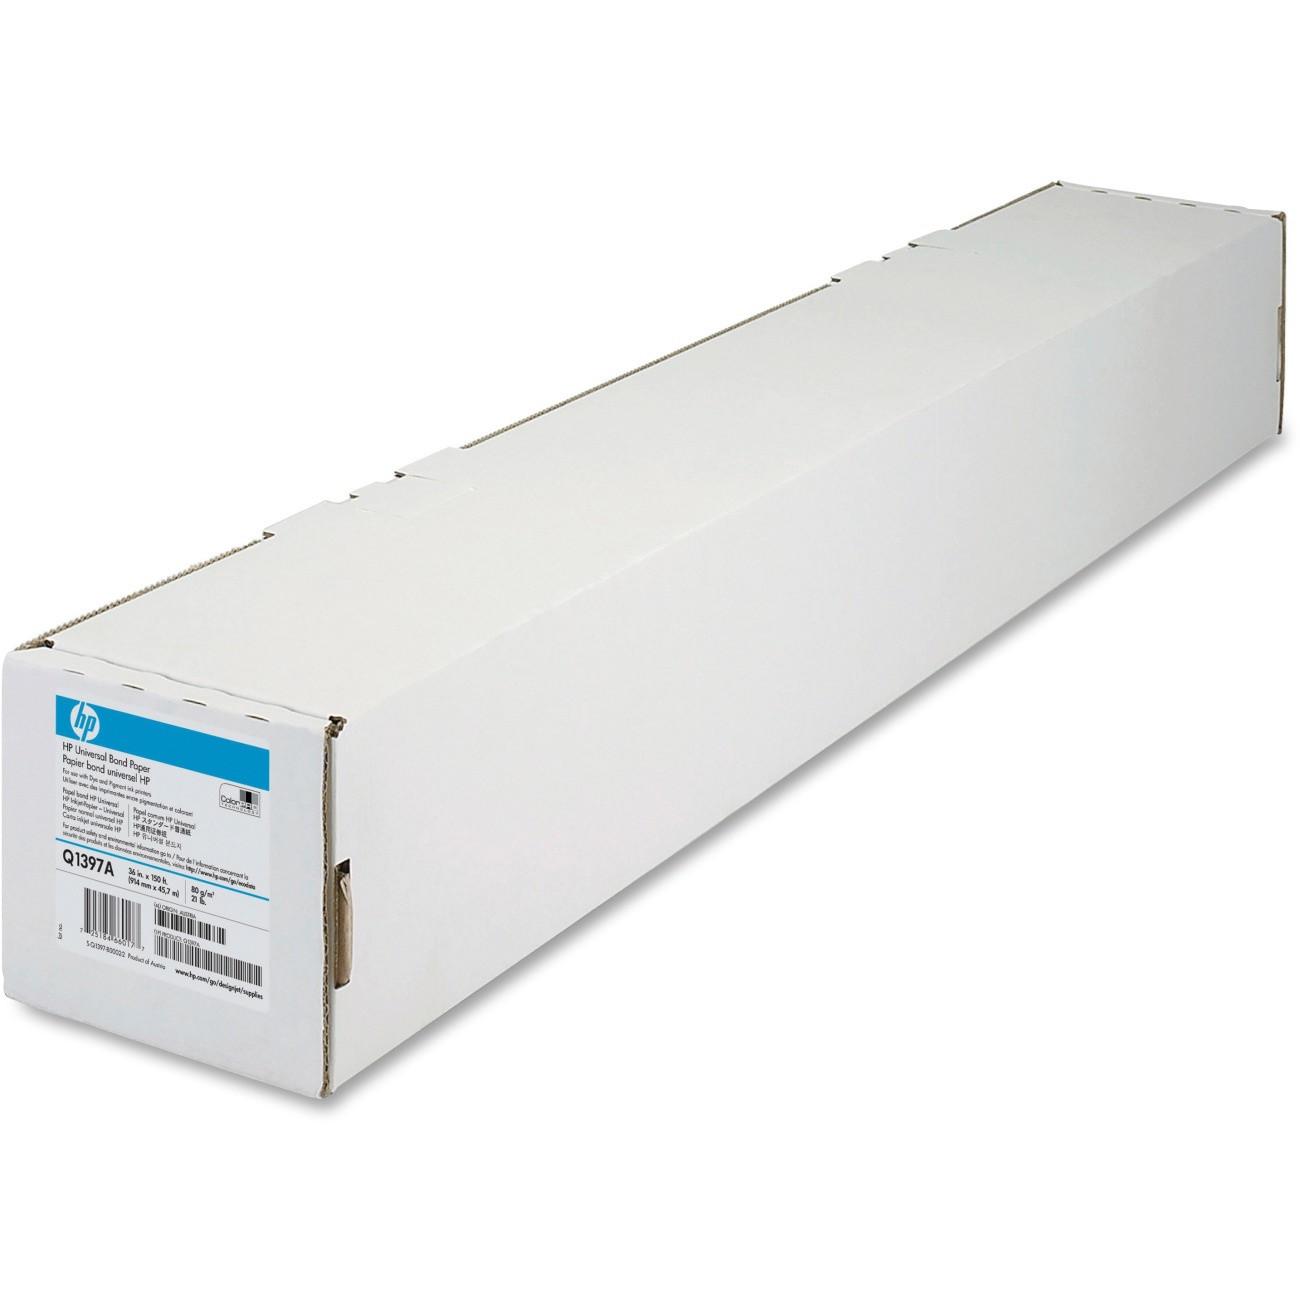 Plotterpapir 80g bond paper 36  914x45,7m HPQ1397A